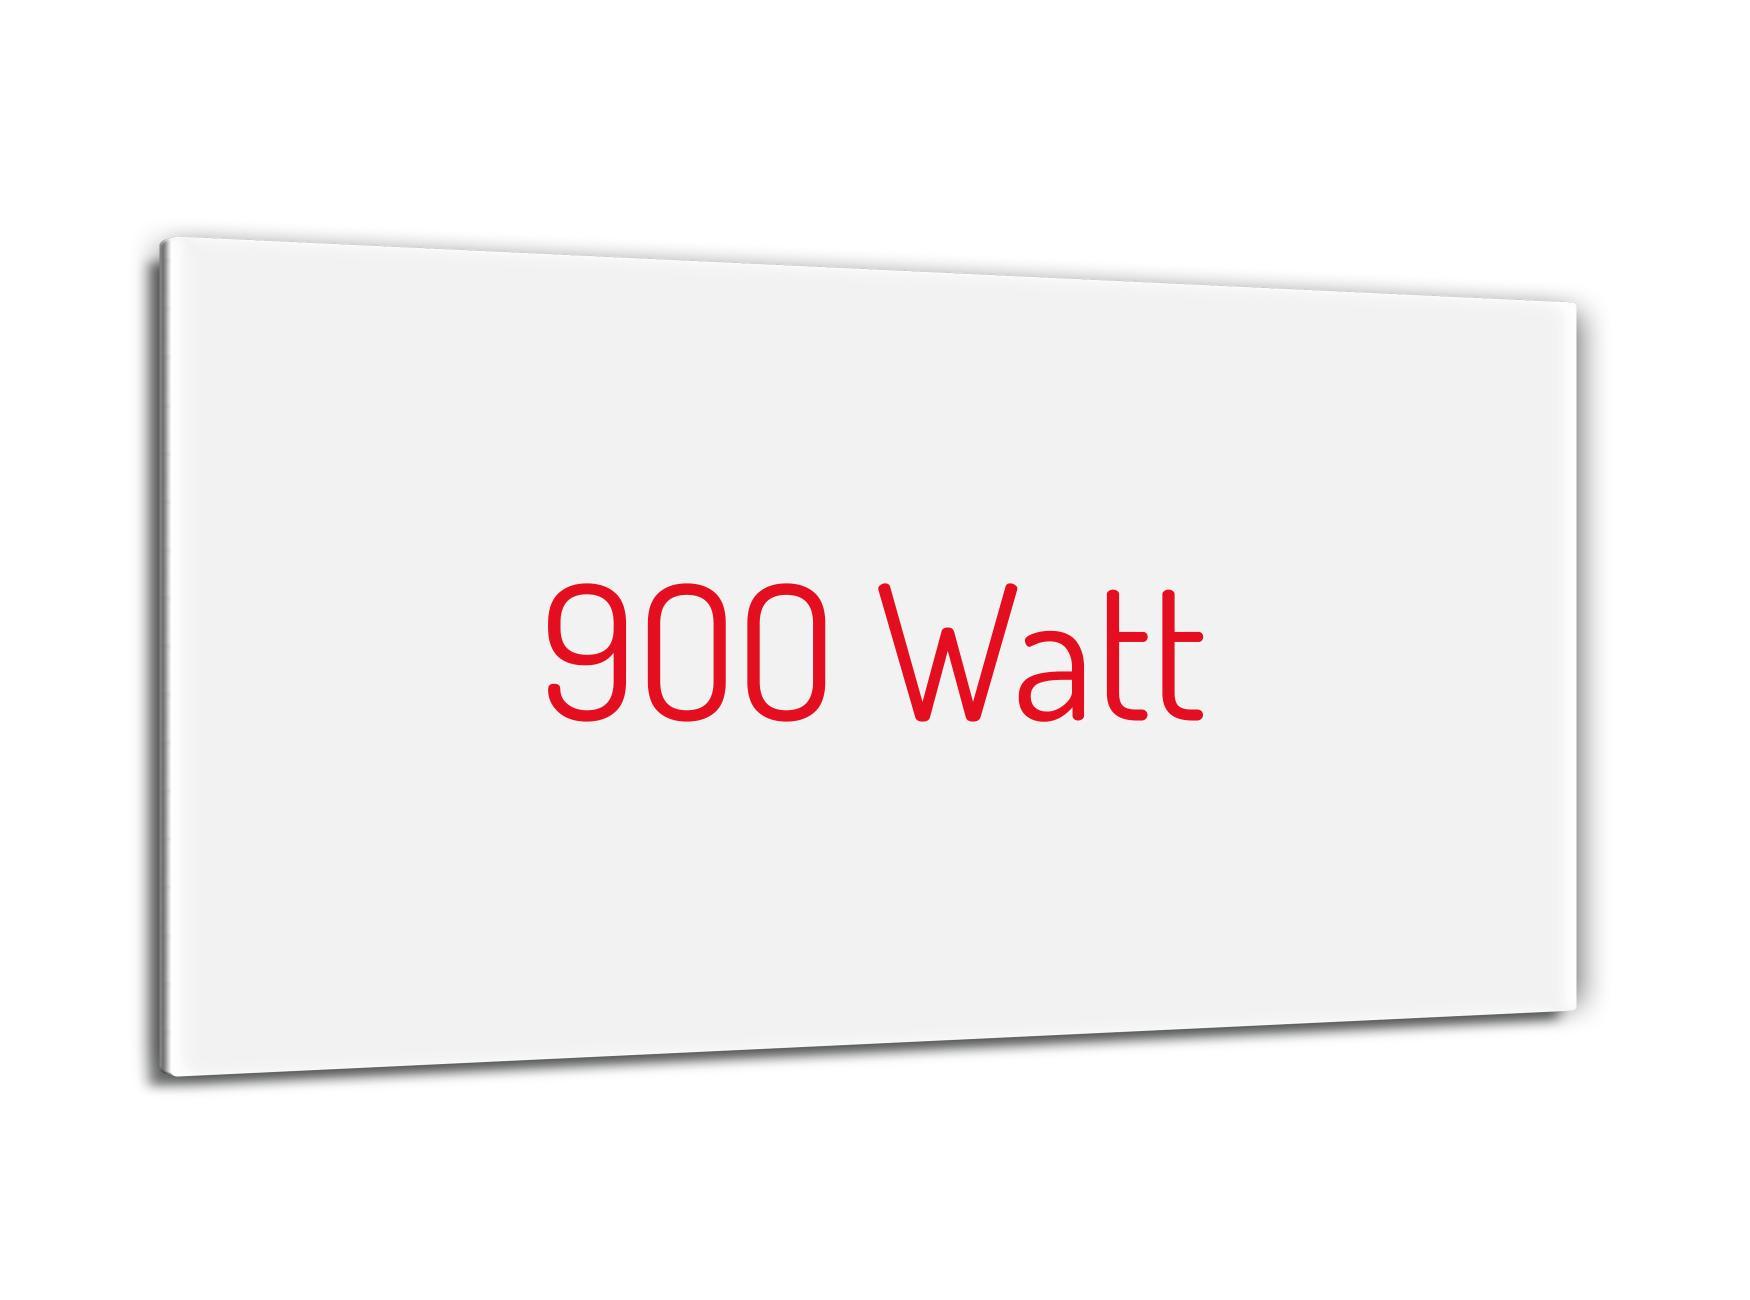 PowerSun Reflex 900 Watt 60x120cm